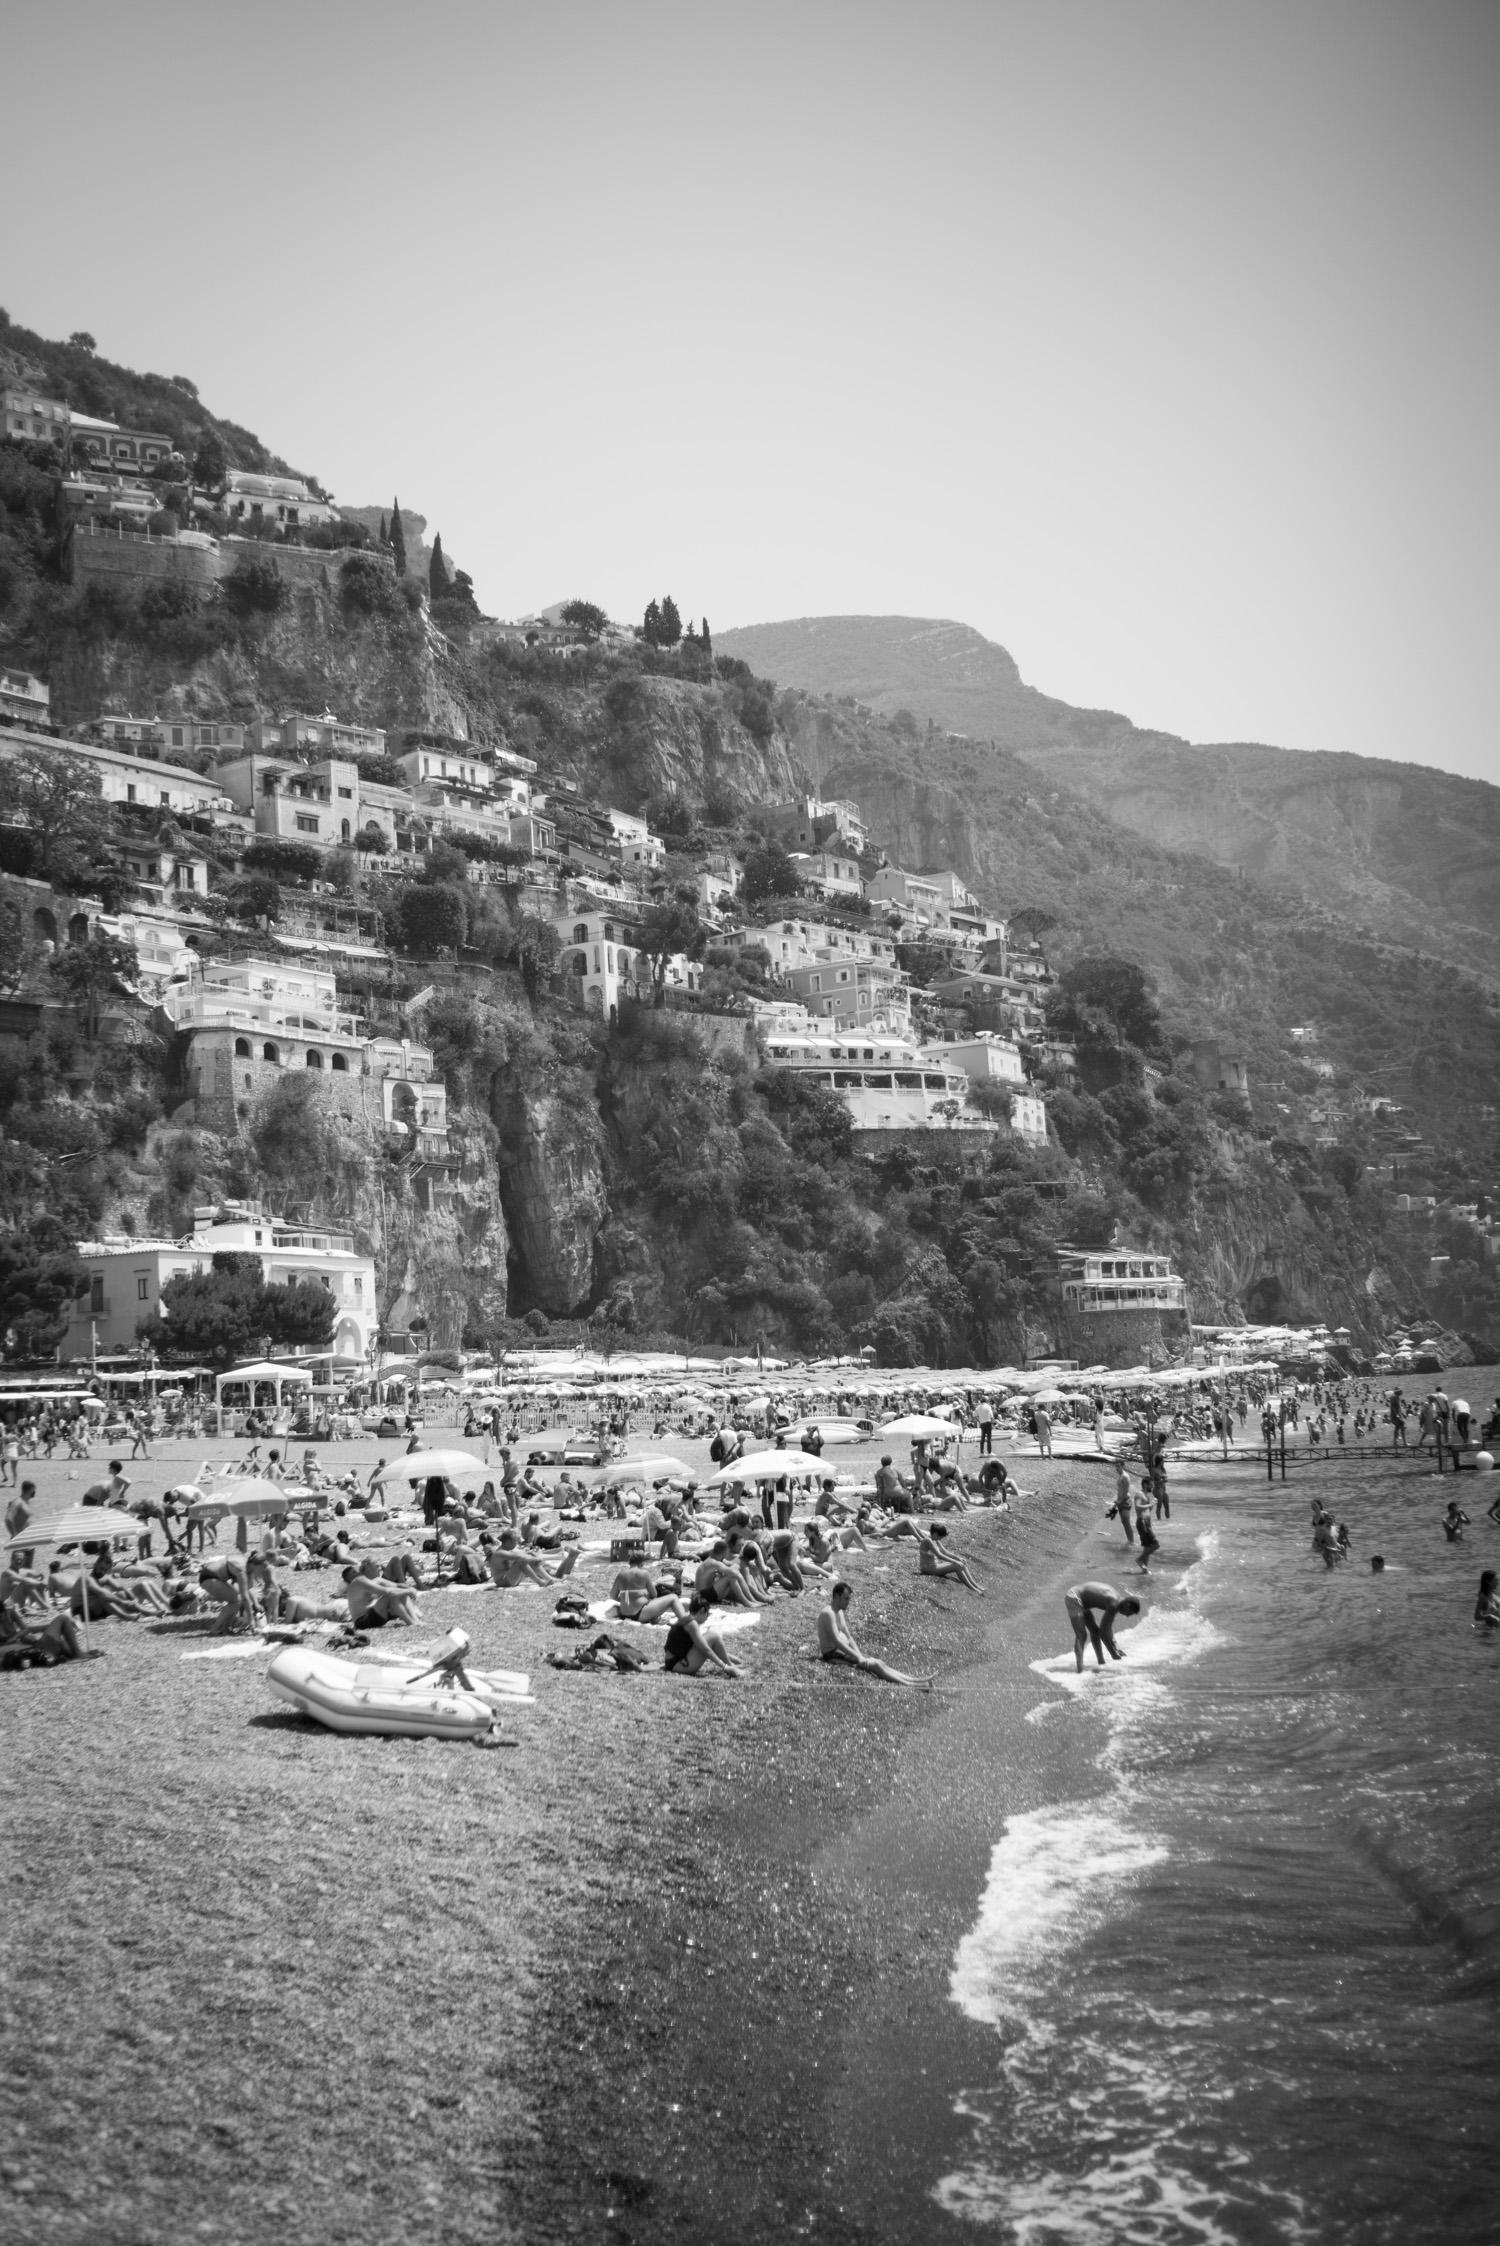 20170722 - Positano (1500) - 21.jpg